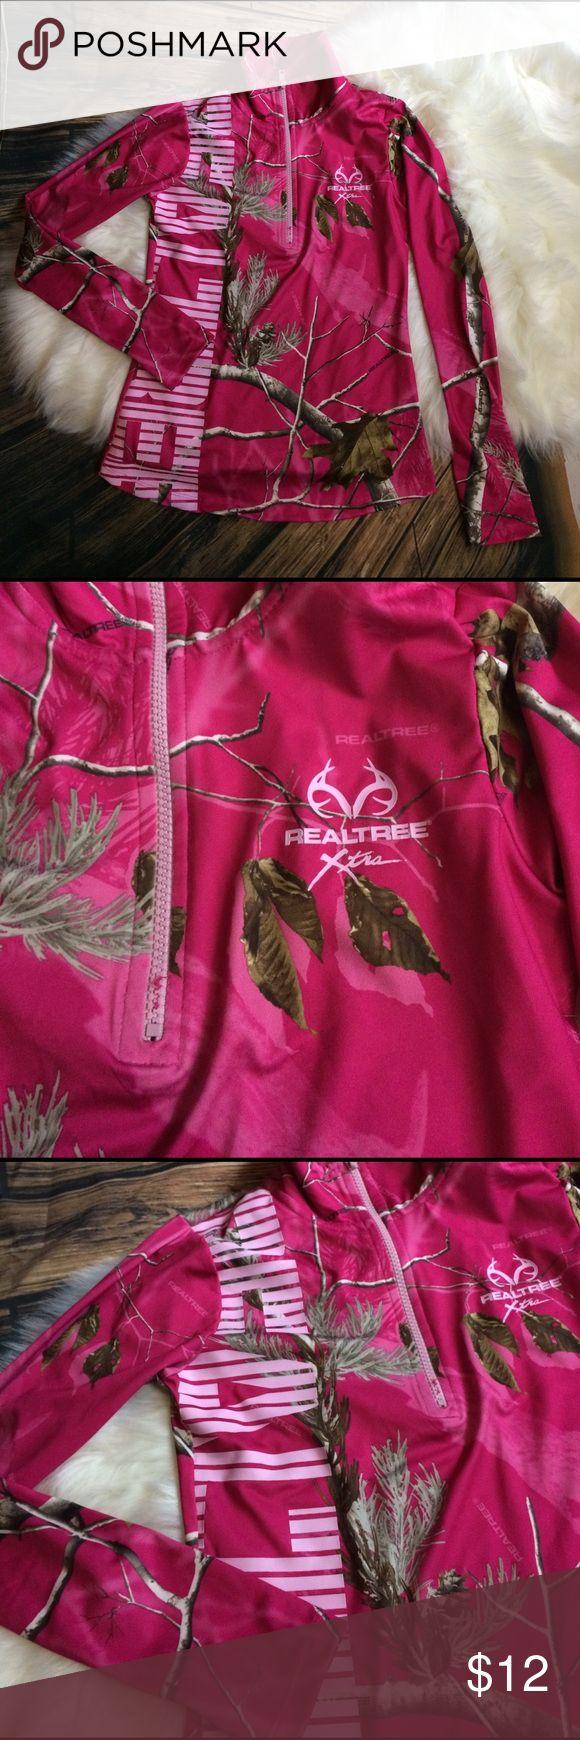 Realtree pullover jacket Real Tree Xtra Pink Camo Jacket Shirt Pullover with  Zipper RealTree Jackets & Coats Utility Jackets